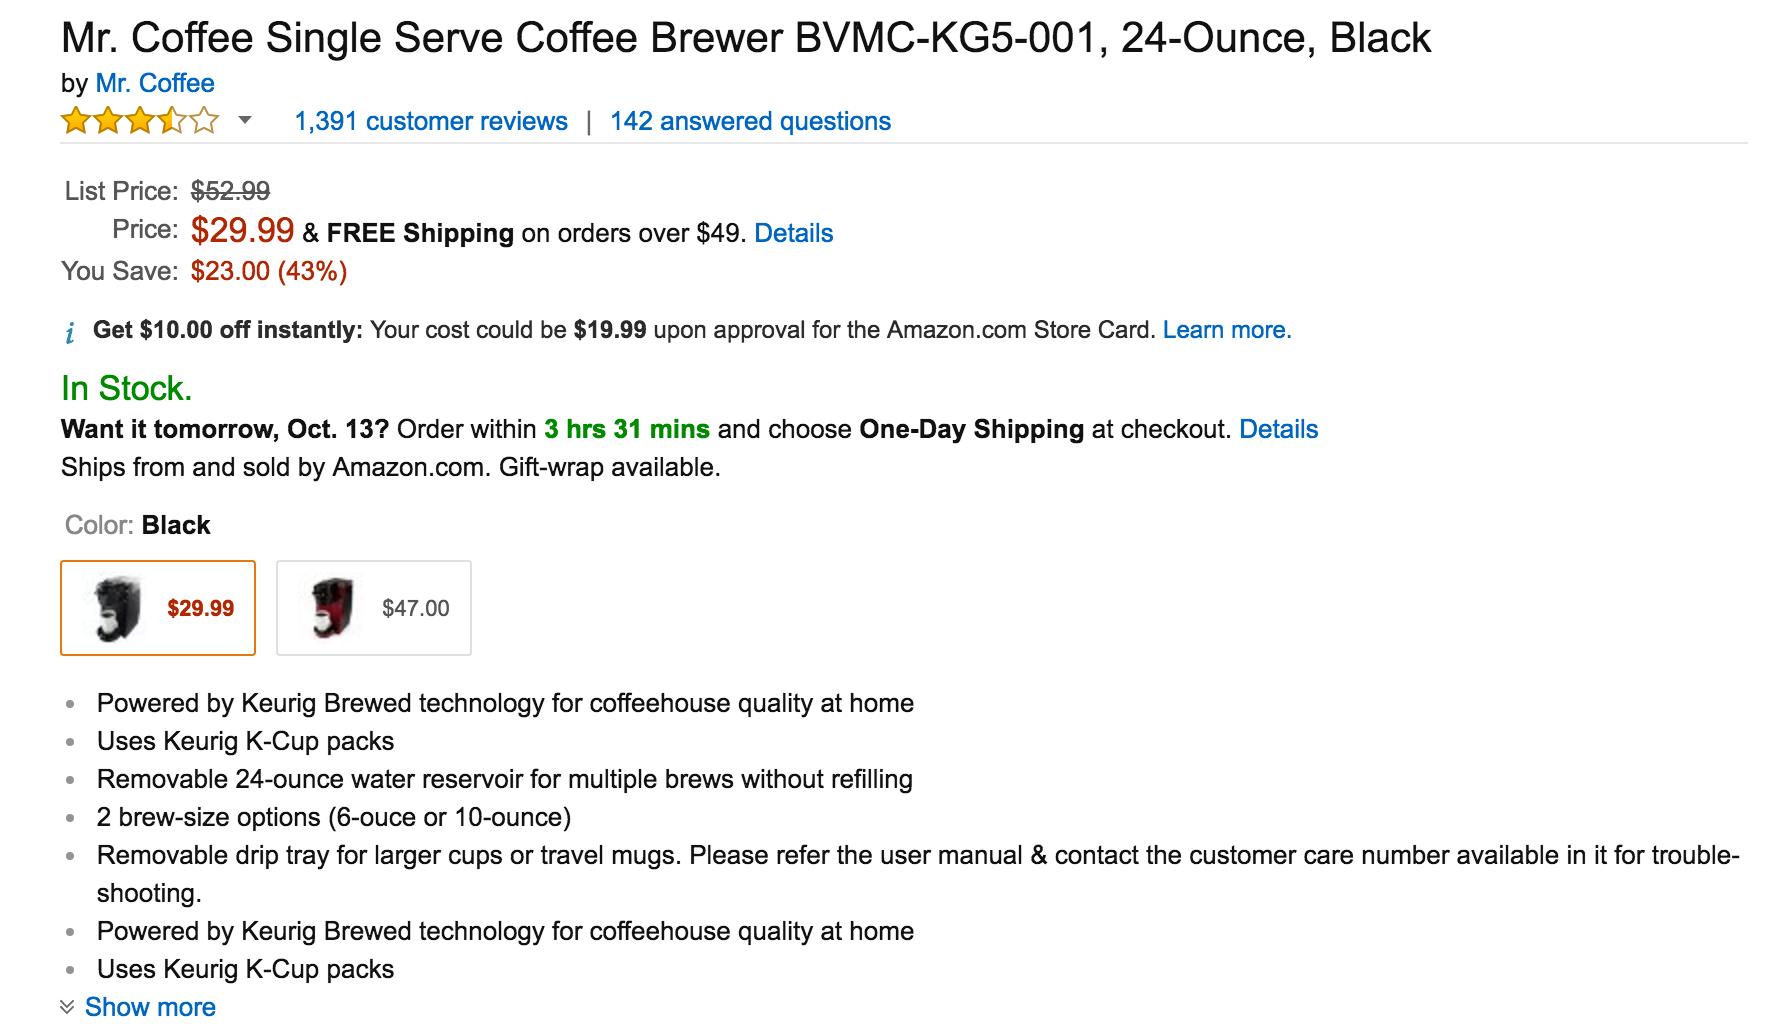 mr-coffee-single-serve-coffee-brewer-in-black-7